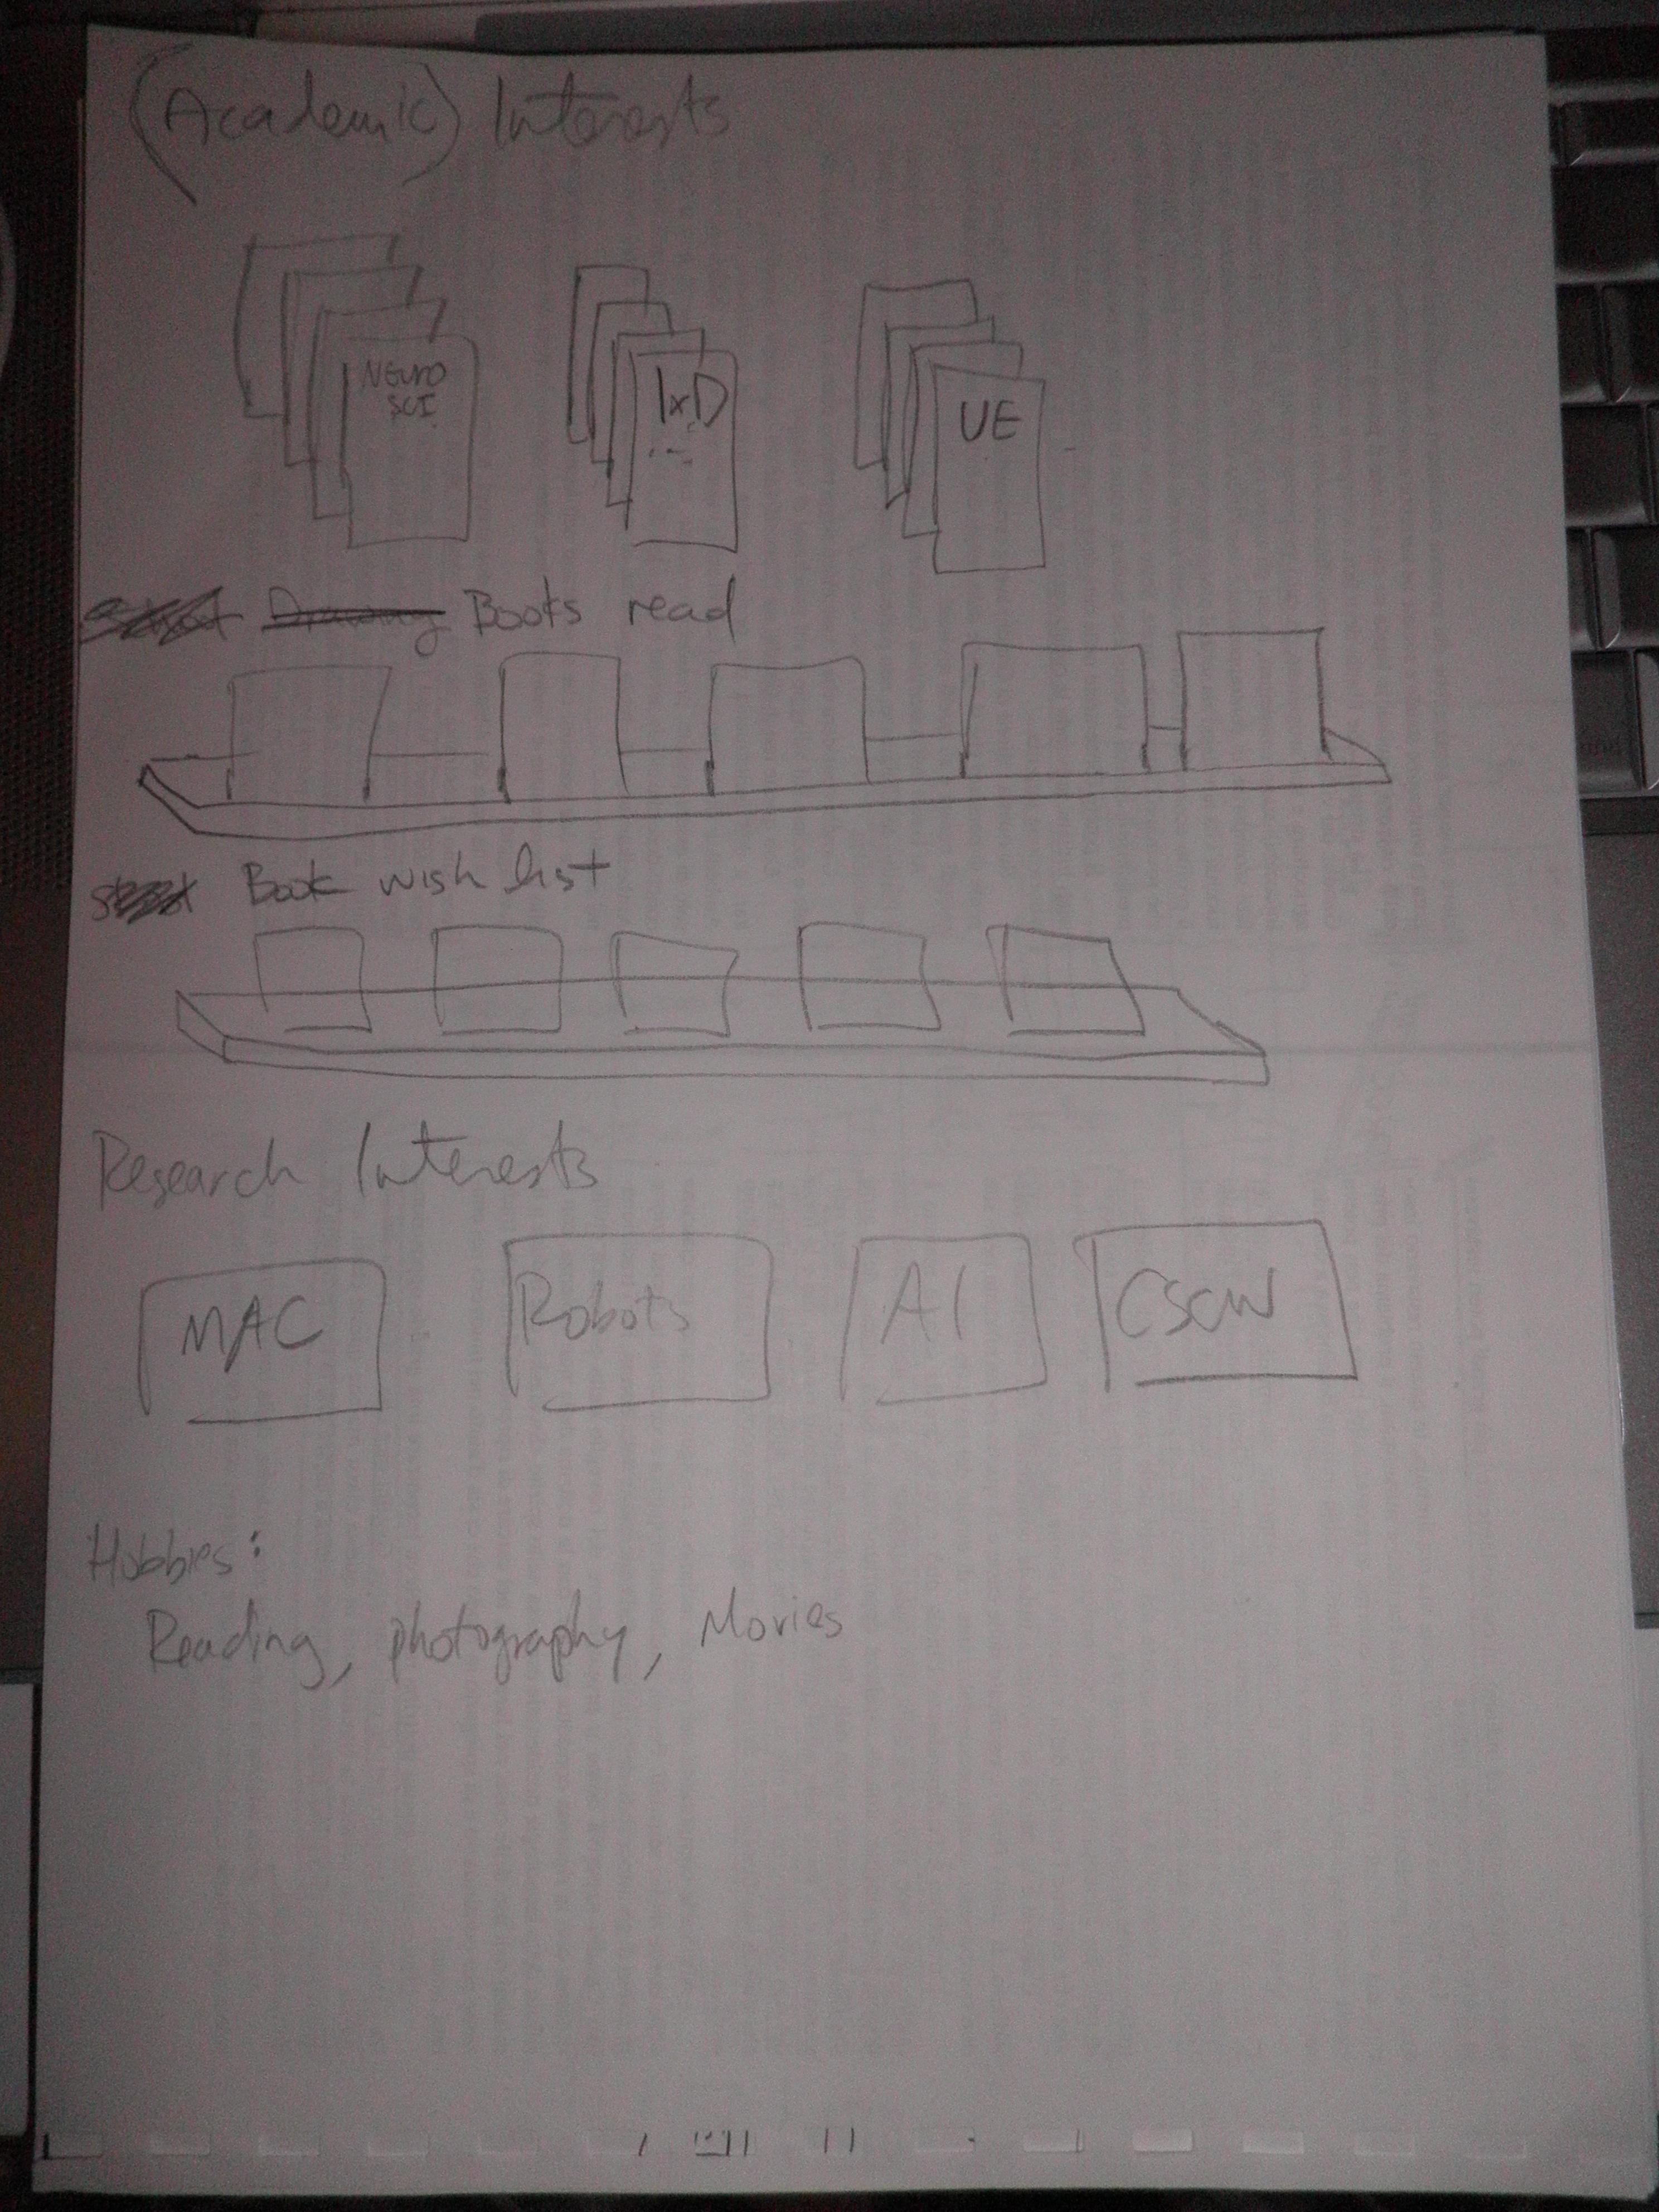 A Concept-Design Sketch